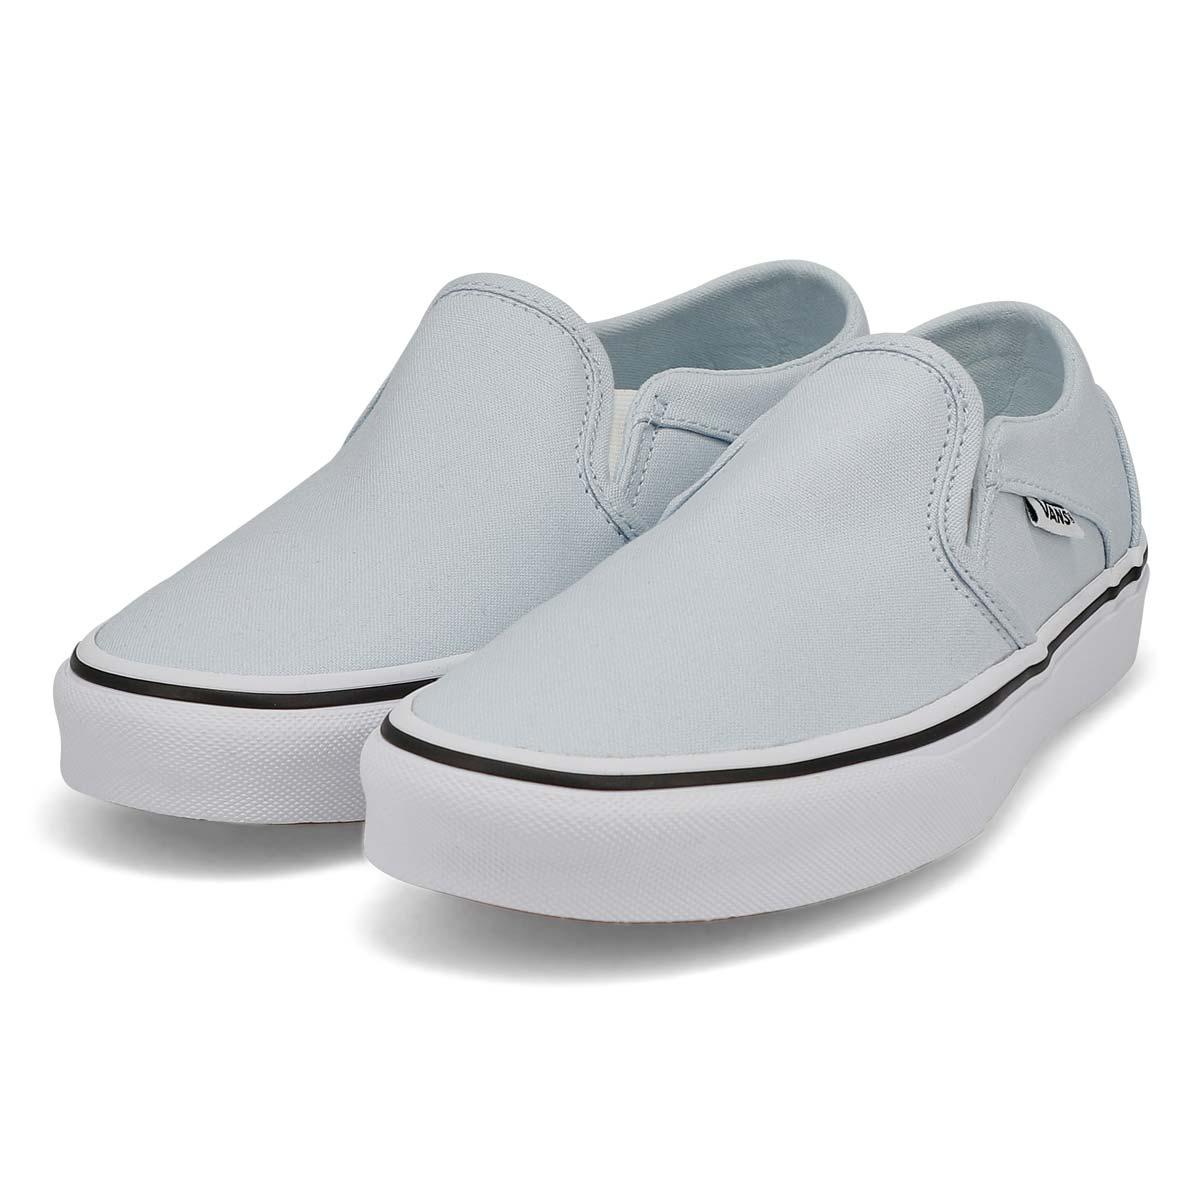 Women's Asher Sneaker - Ballad Blue/White